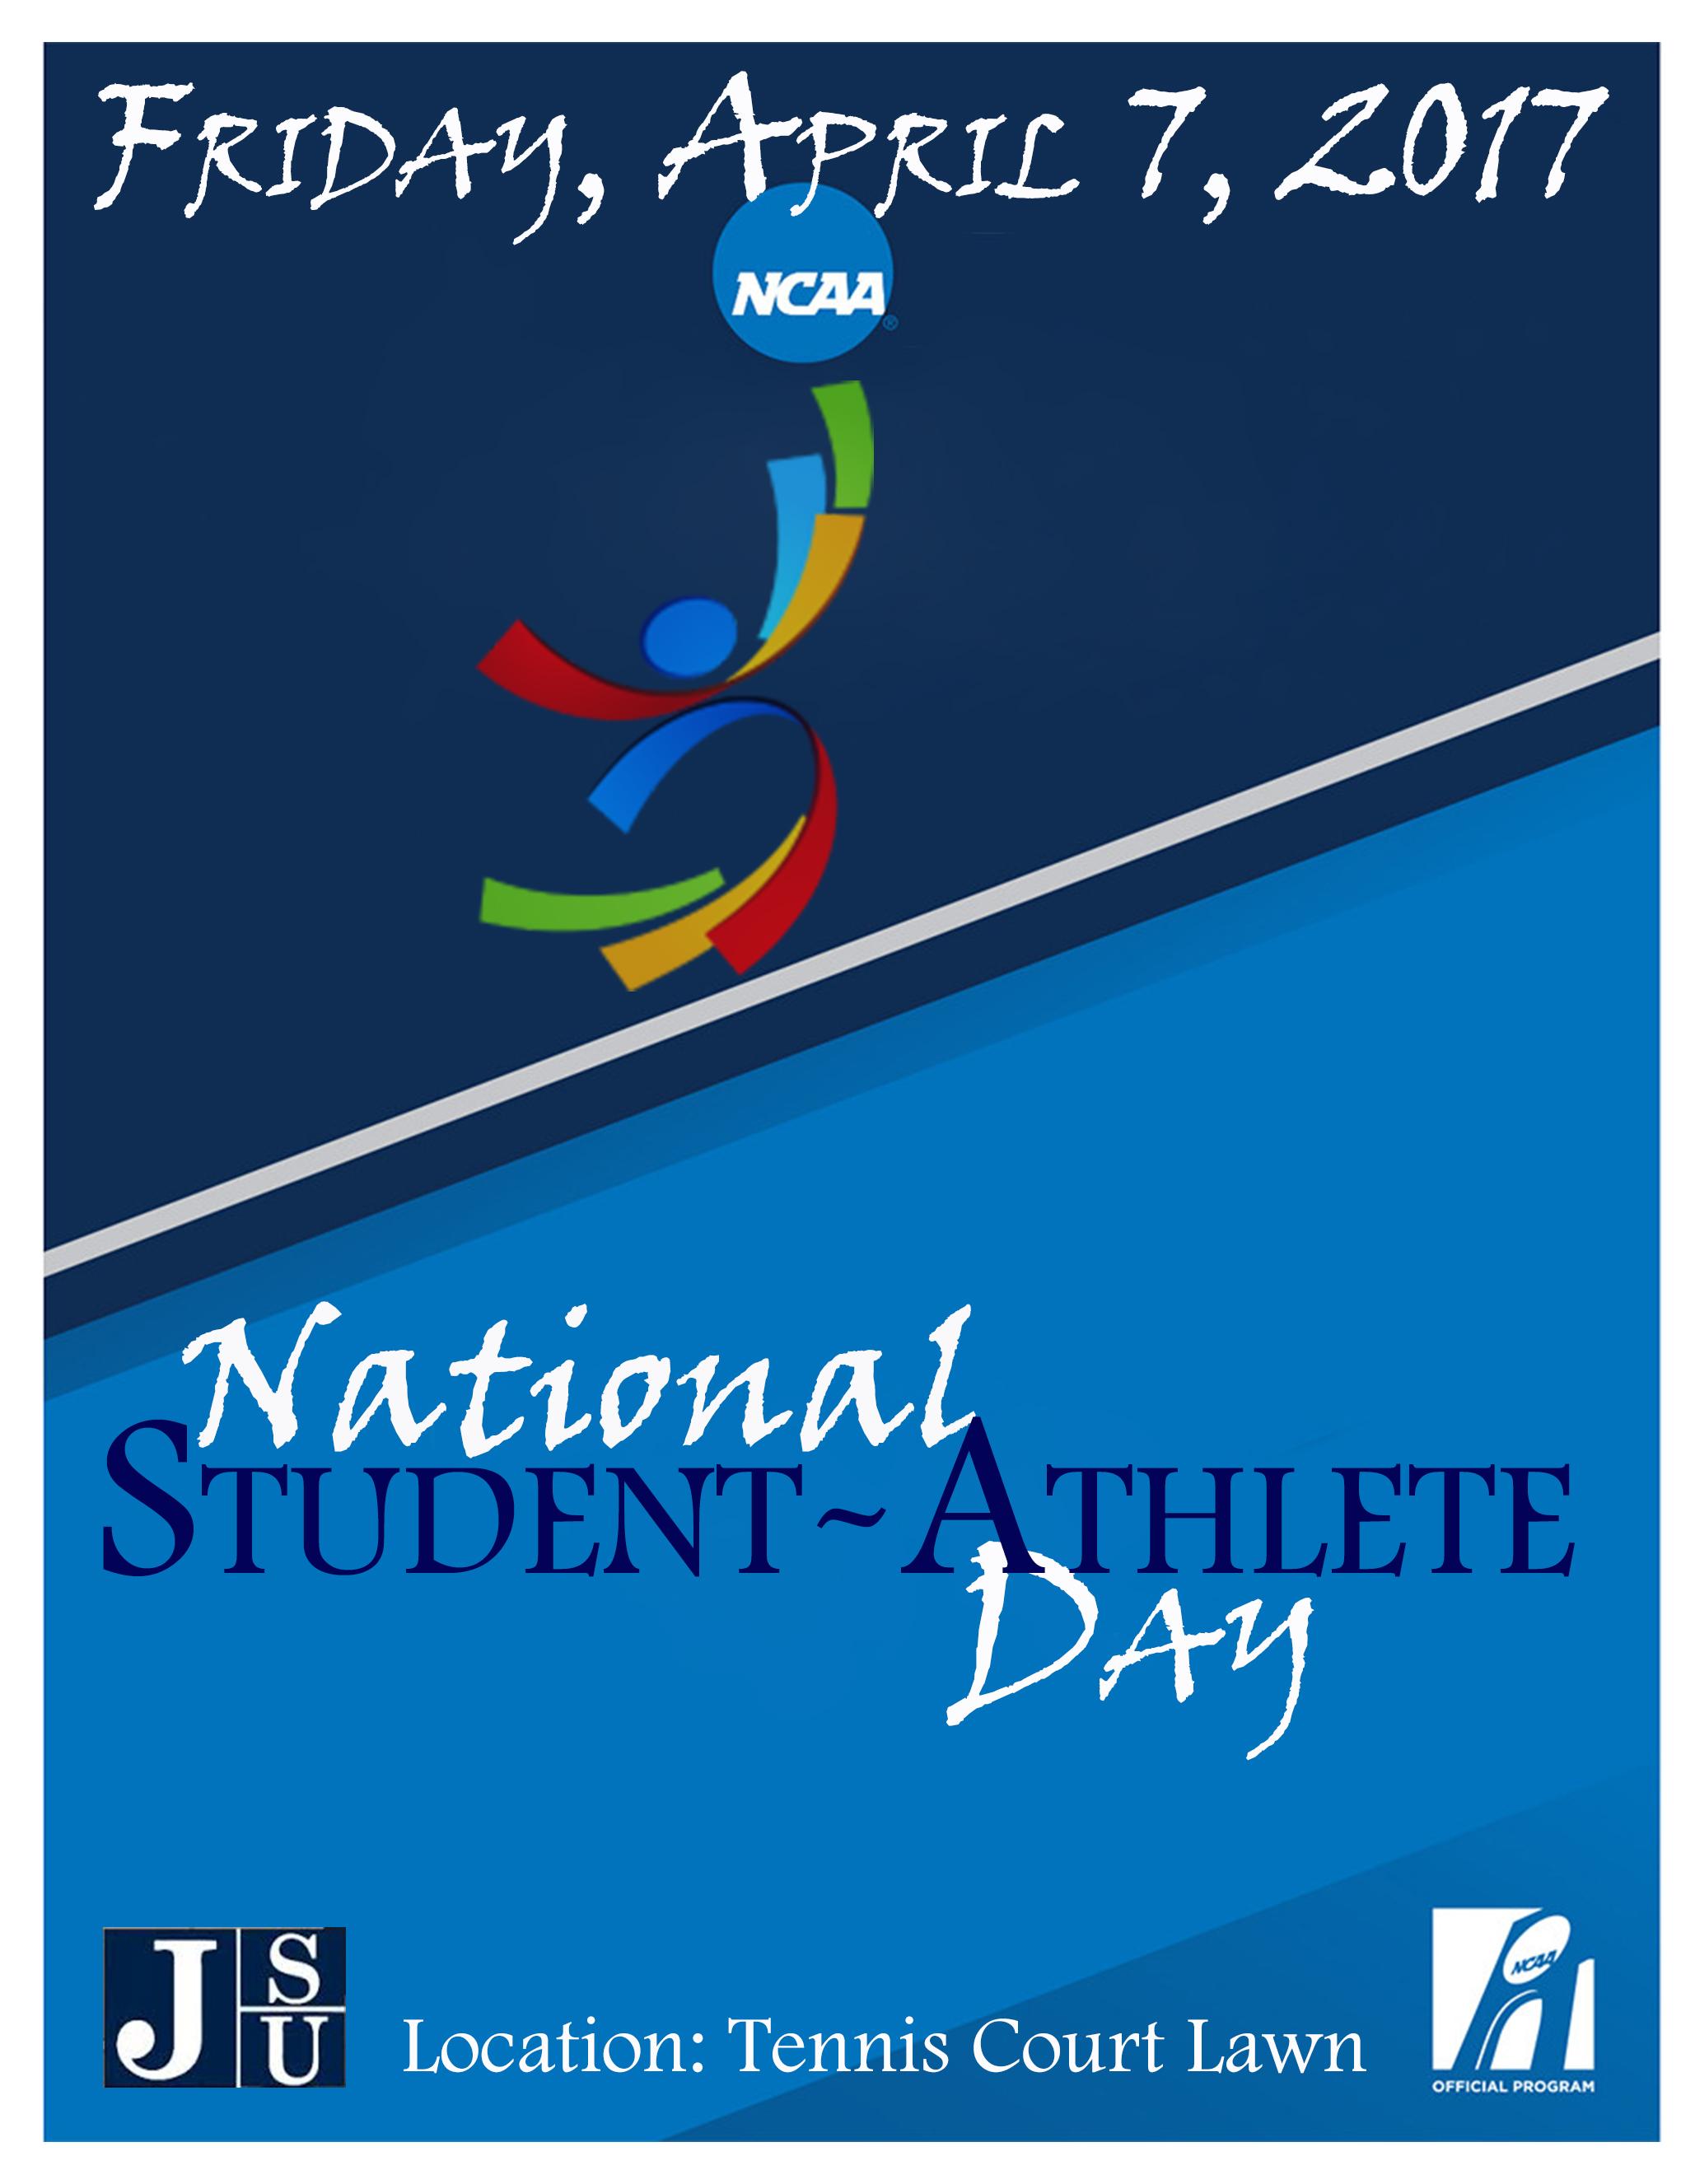 Student-Athlete Day Celebration